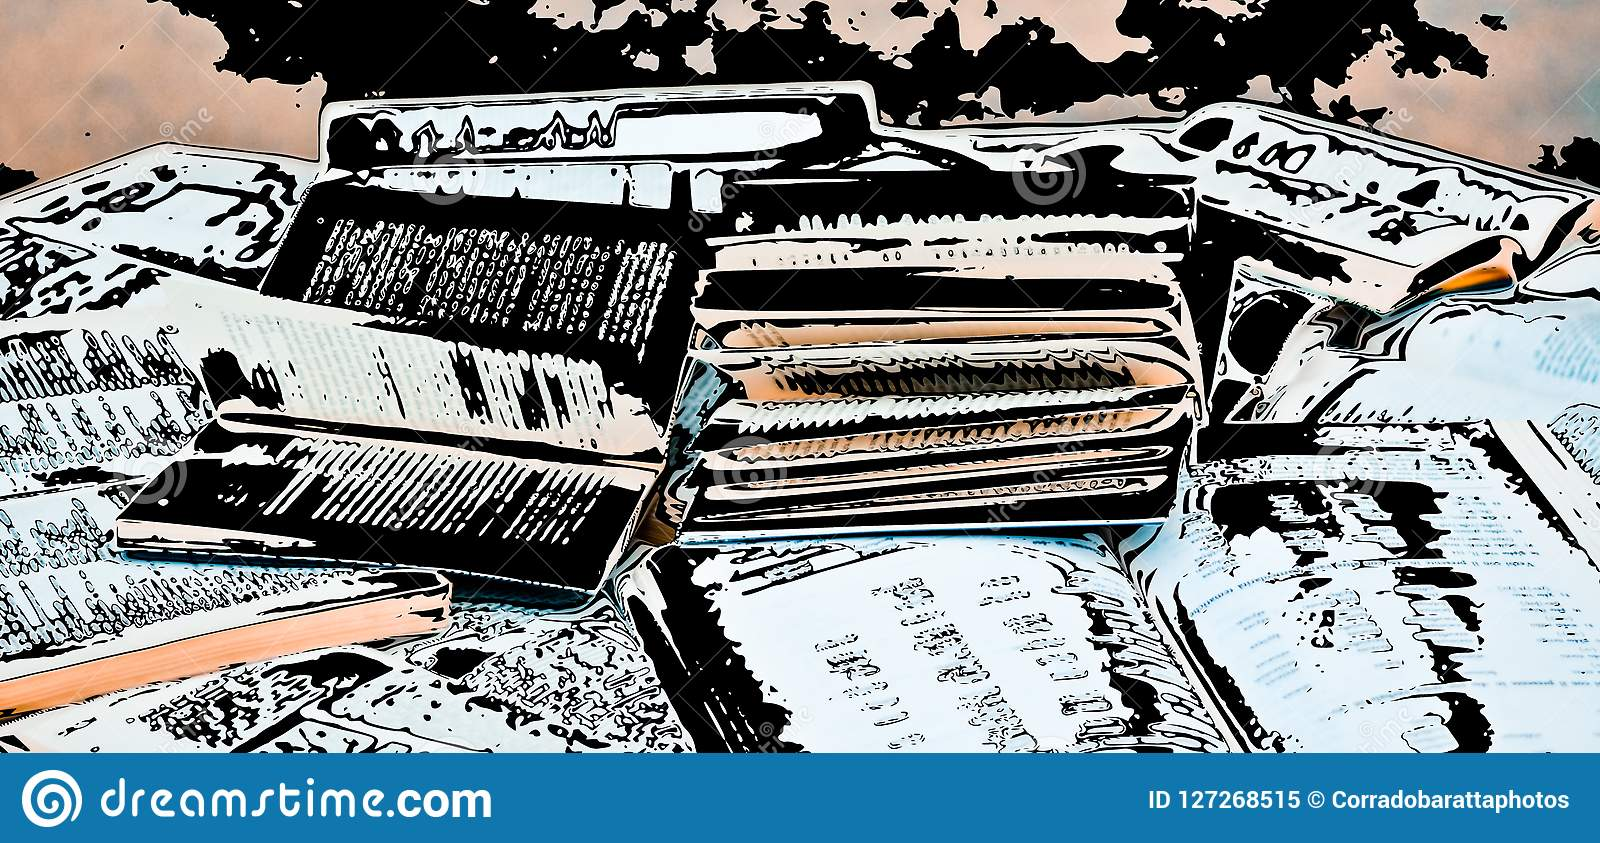 open books in bulk